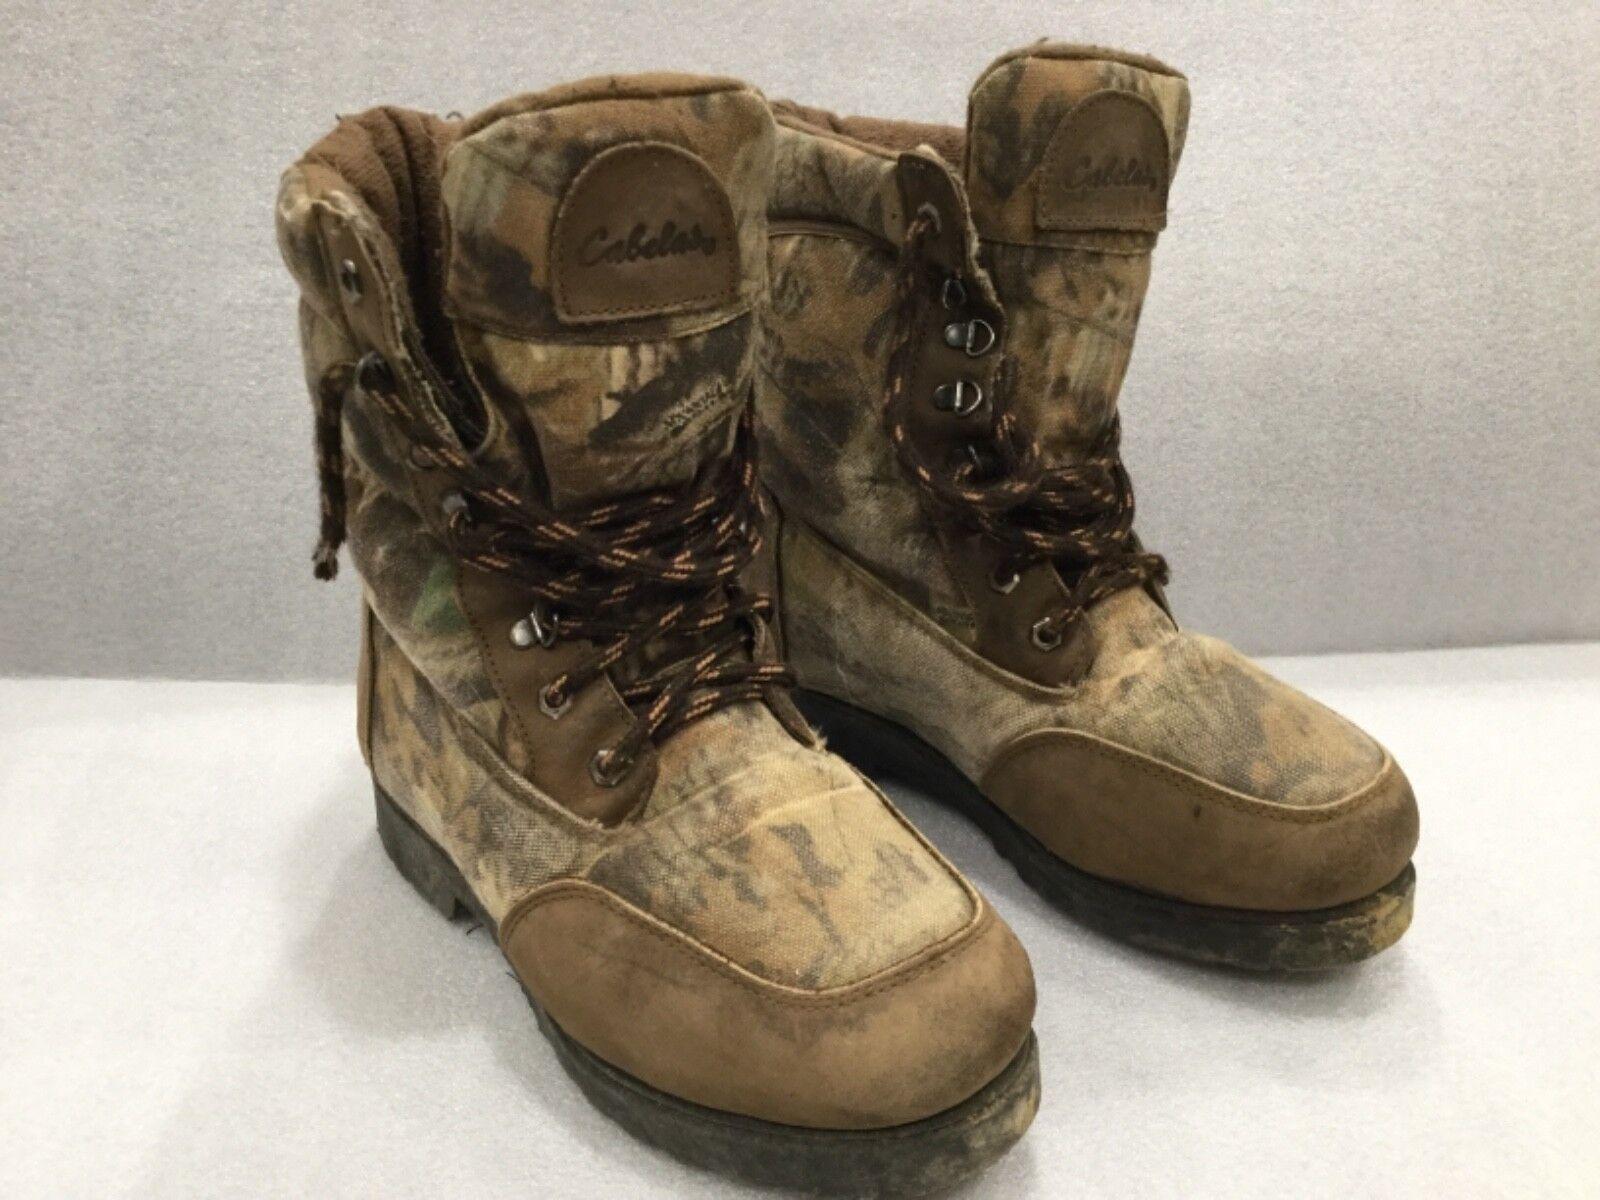 CABELA'S GoreTex Camo Hiking Hunting Boots Women's Size 8.5